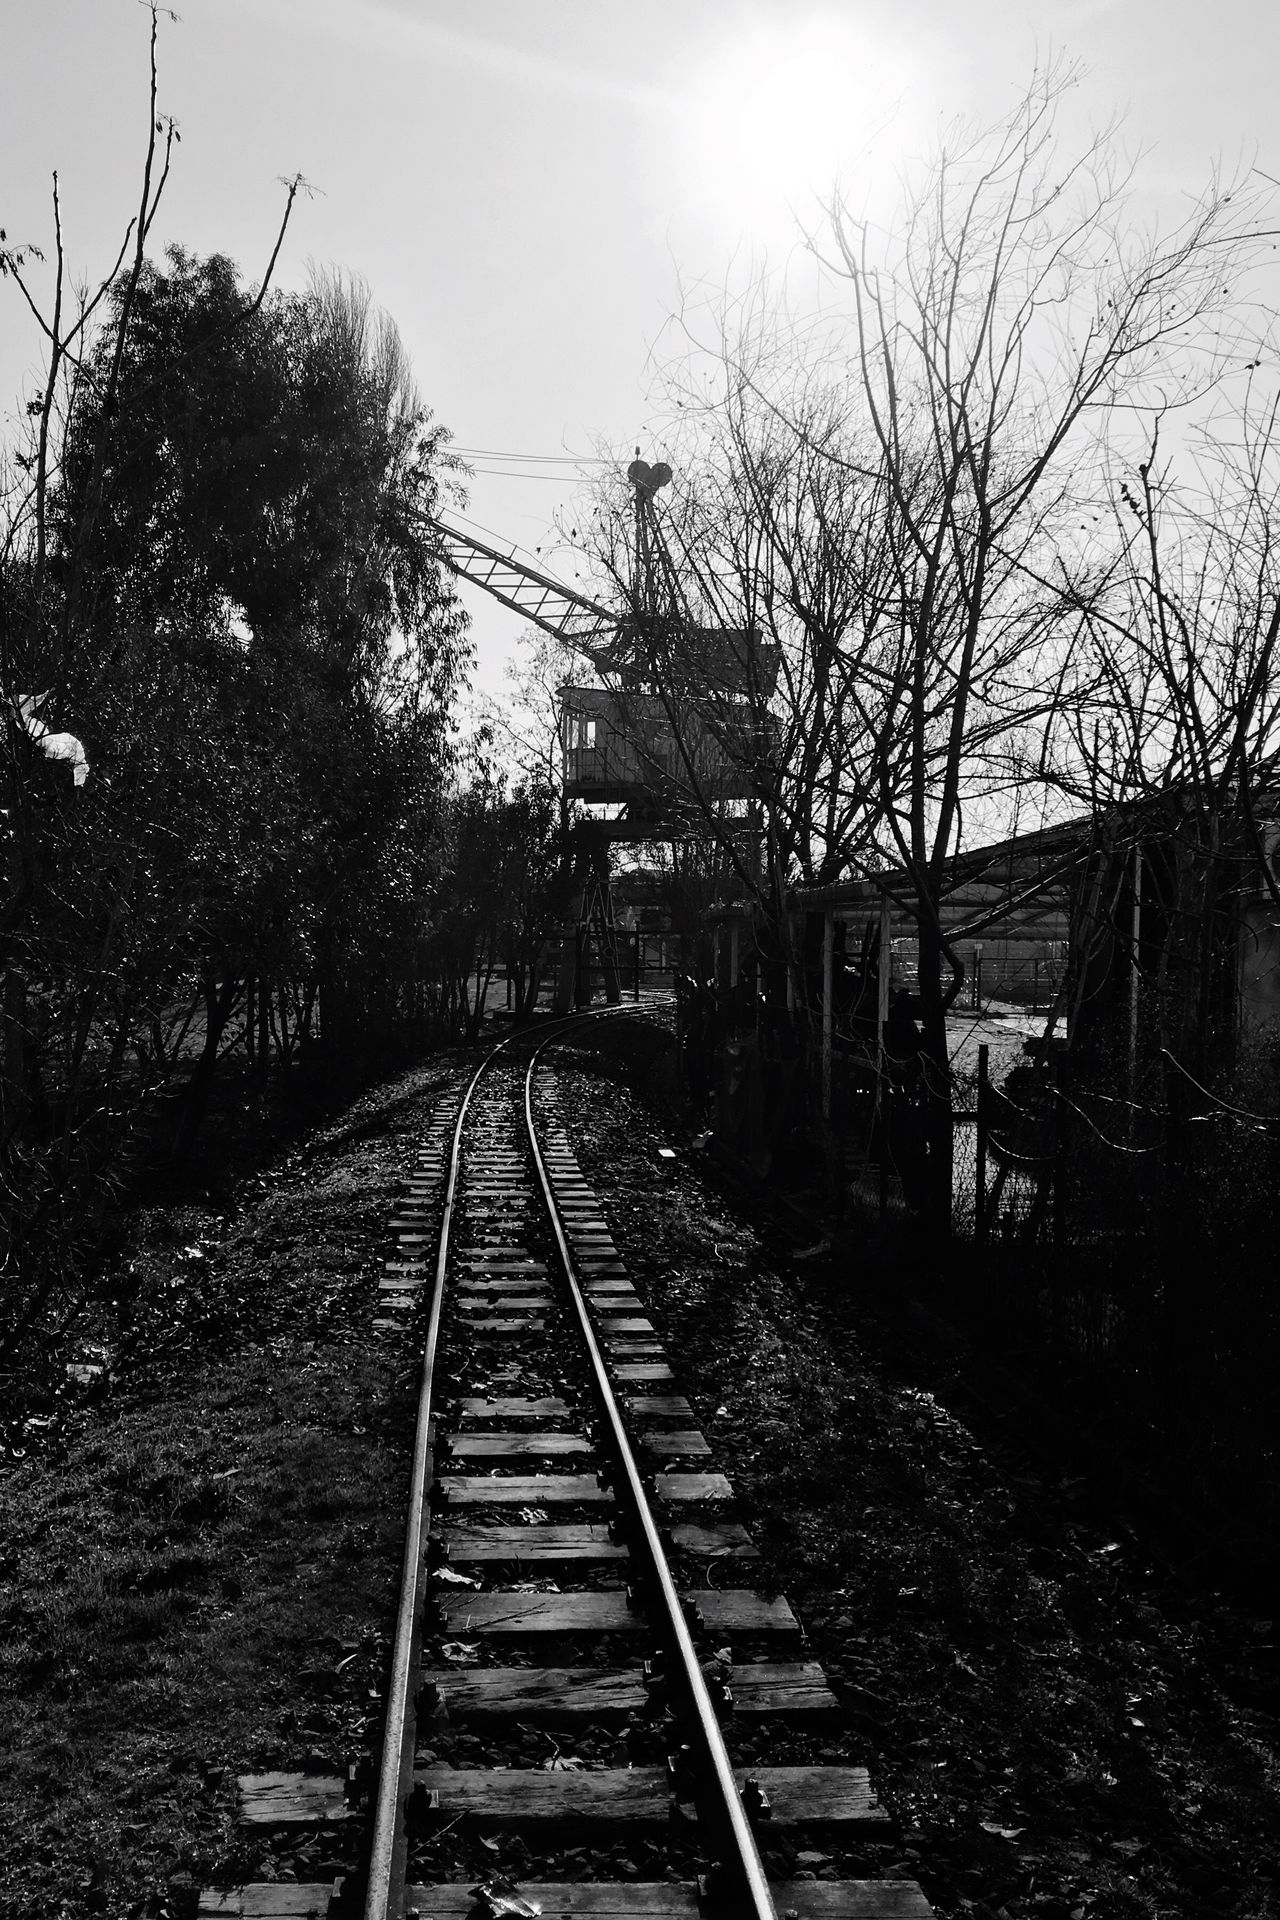 Railroad Track Tree The Way Forward Sky Railway Railway Track Railroad B&w Blackandwhite Black And White Outdoors